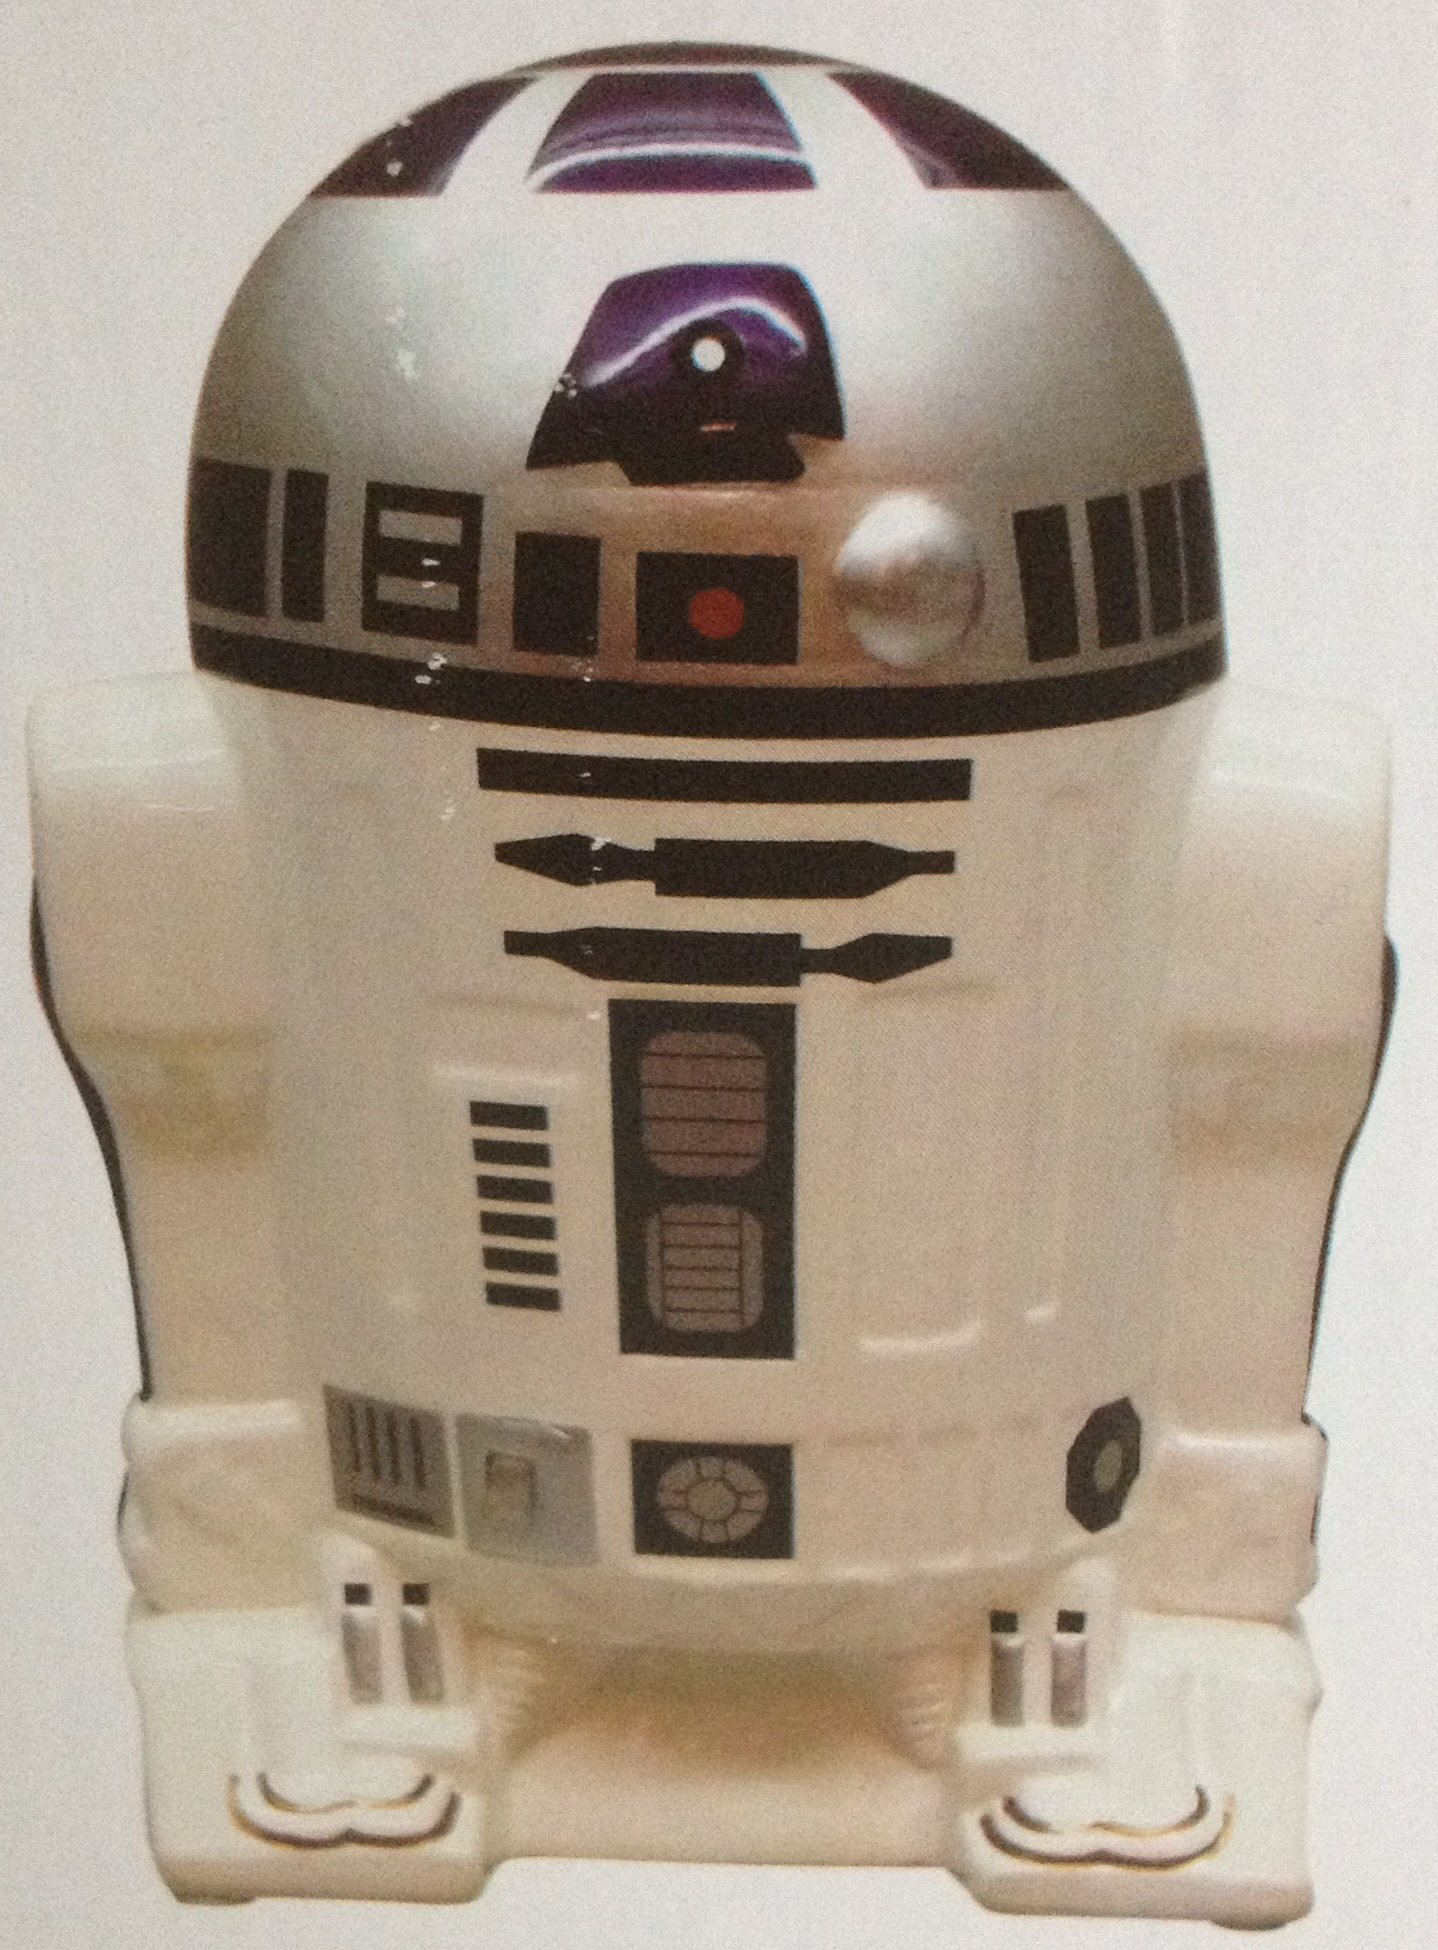 Star Wars R2d2 Bank by Star Wars (Image #2)